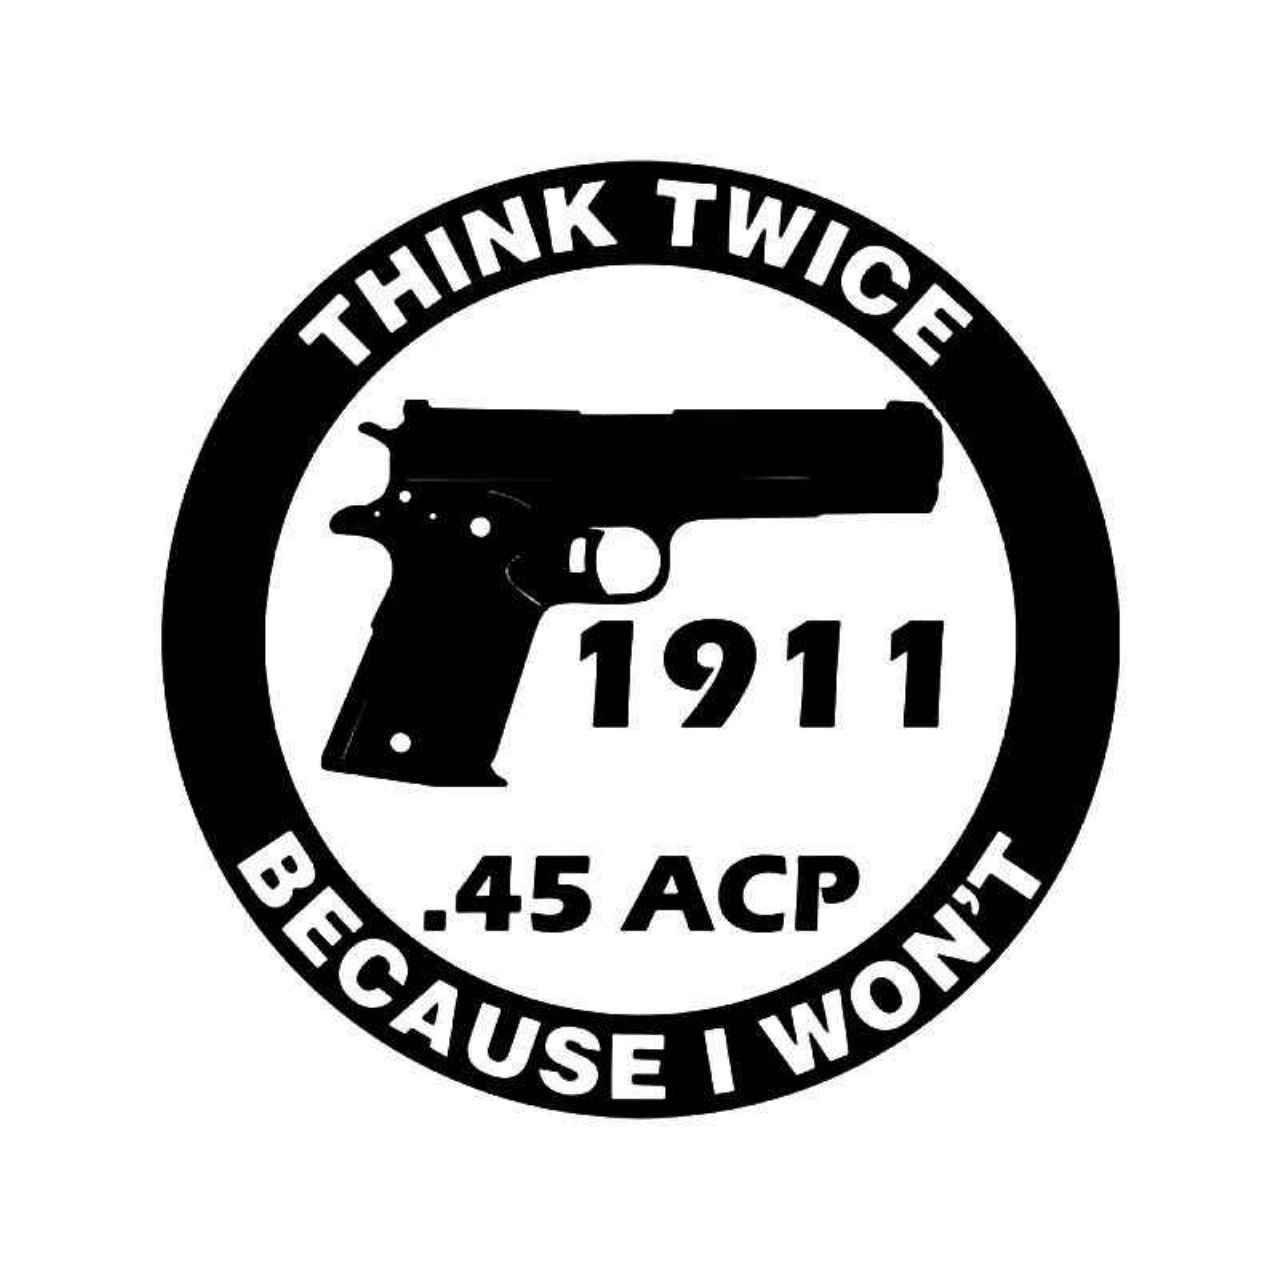 Warning Think Twice Handgun Gun Vinyl Decal Sticker Guns And - Custom gun barrel stickersgun decals shotgun barrel sticker shooting ammo decal